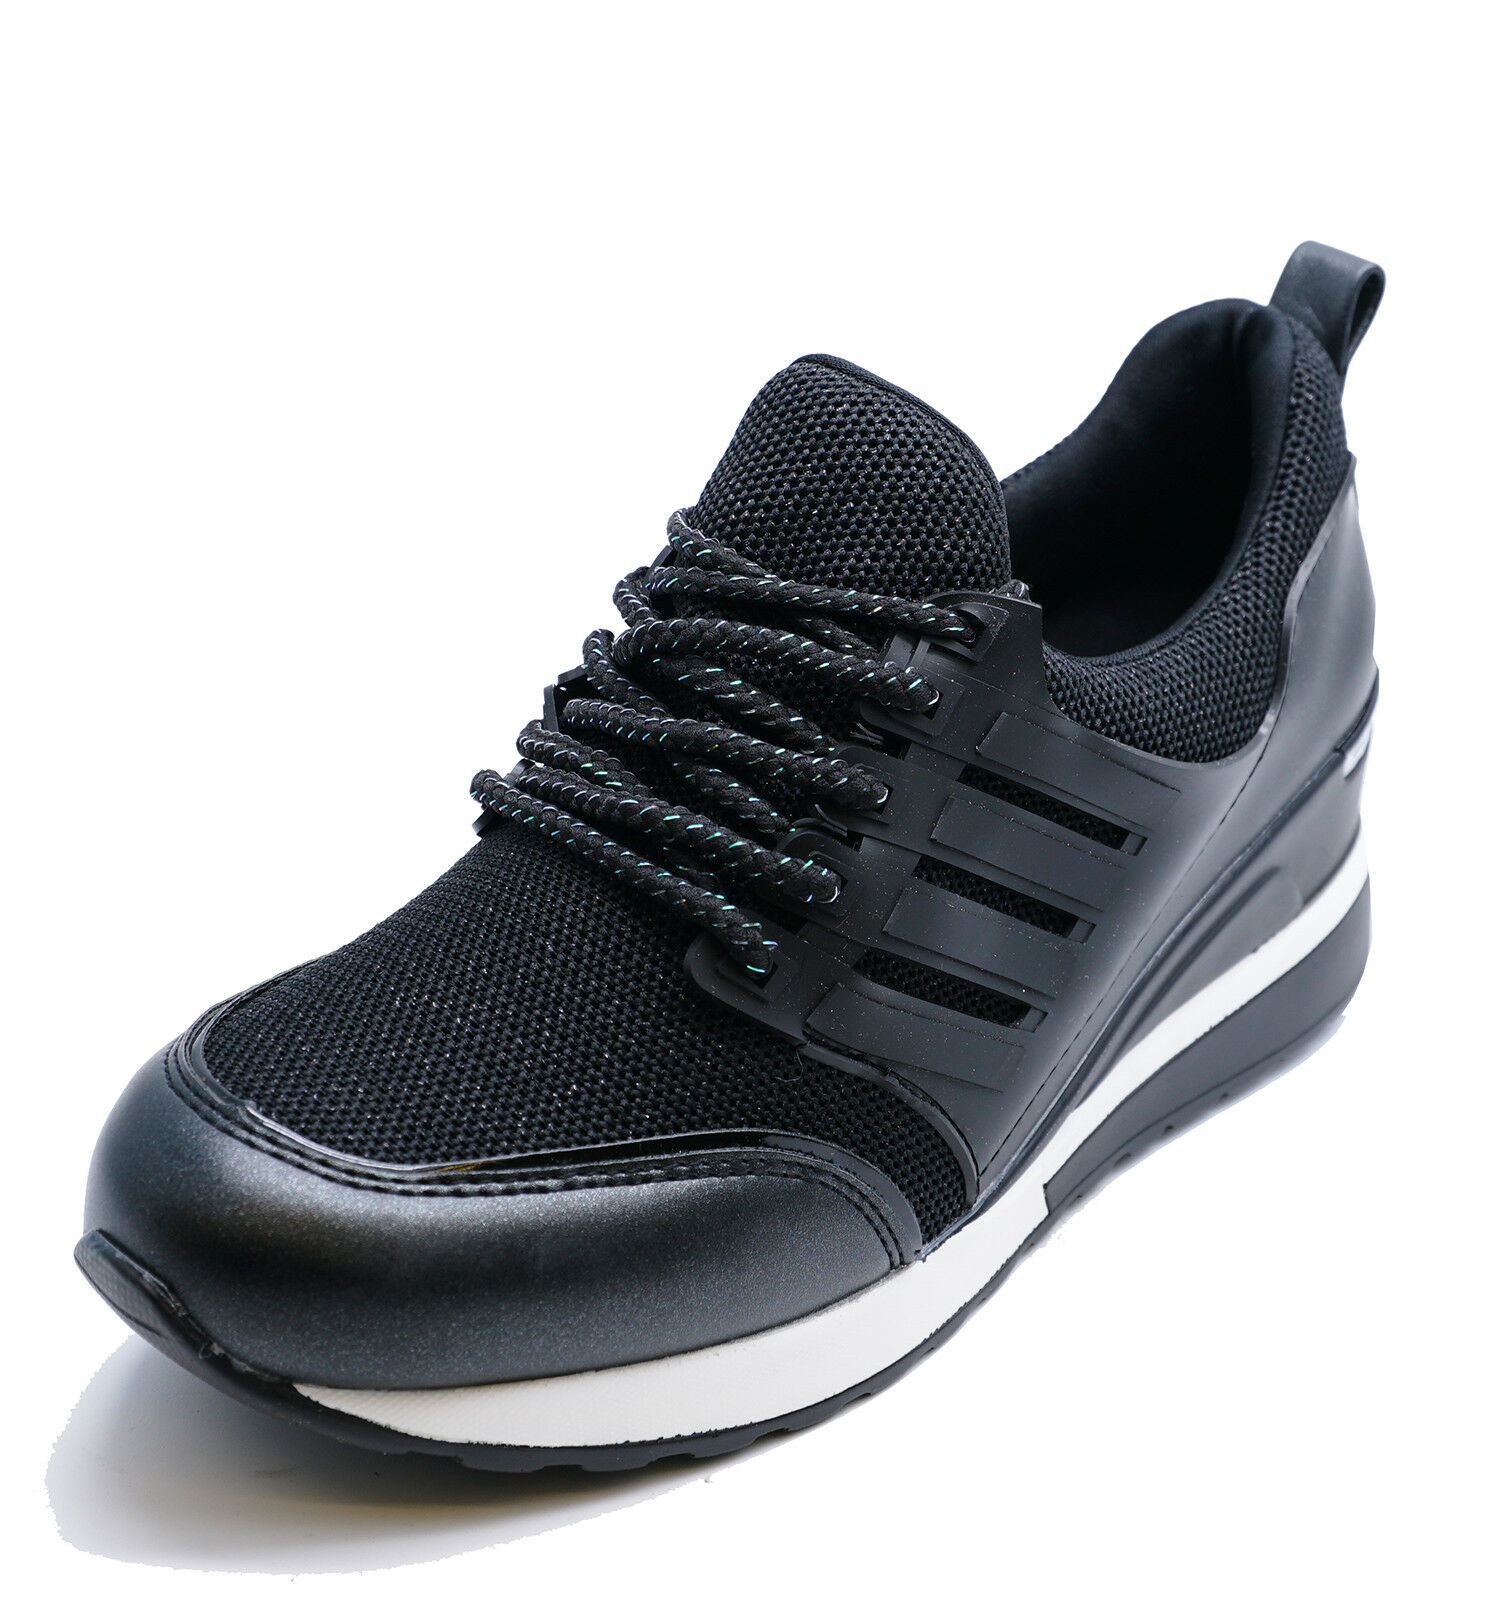 WOMENS GREY SLIP-ON RUNNING TRAINERS GYM PUMPS PLIMSOLLS WALKING SHOES UK 3-8